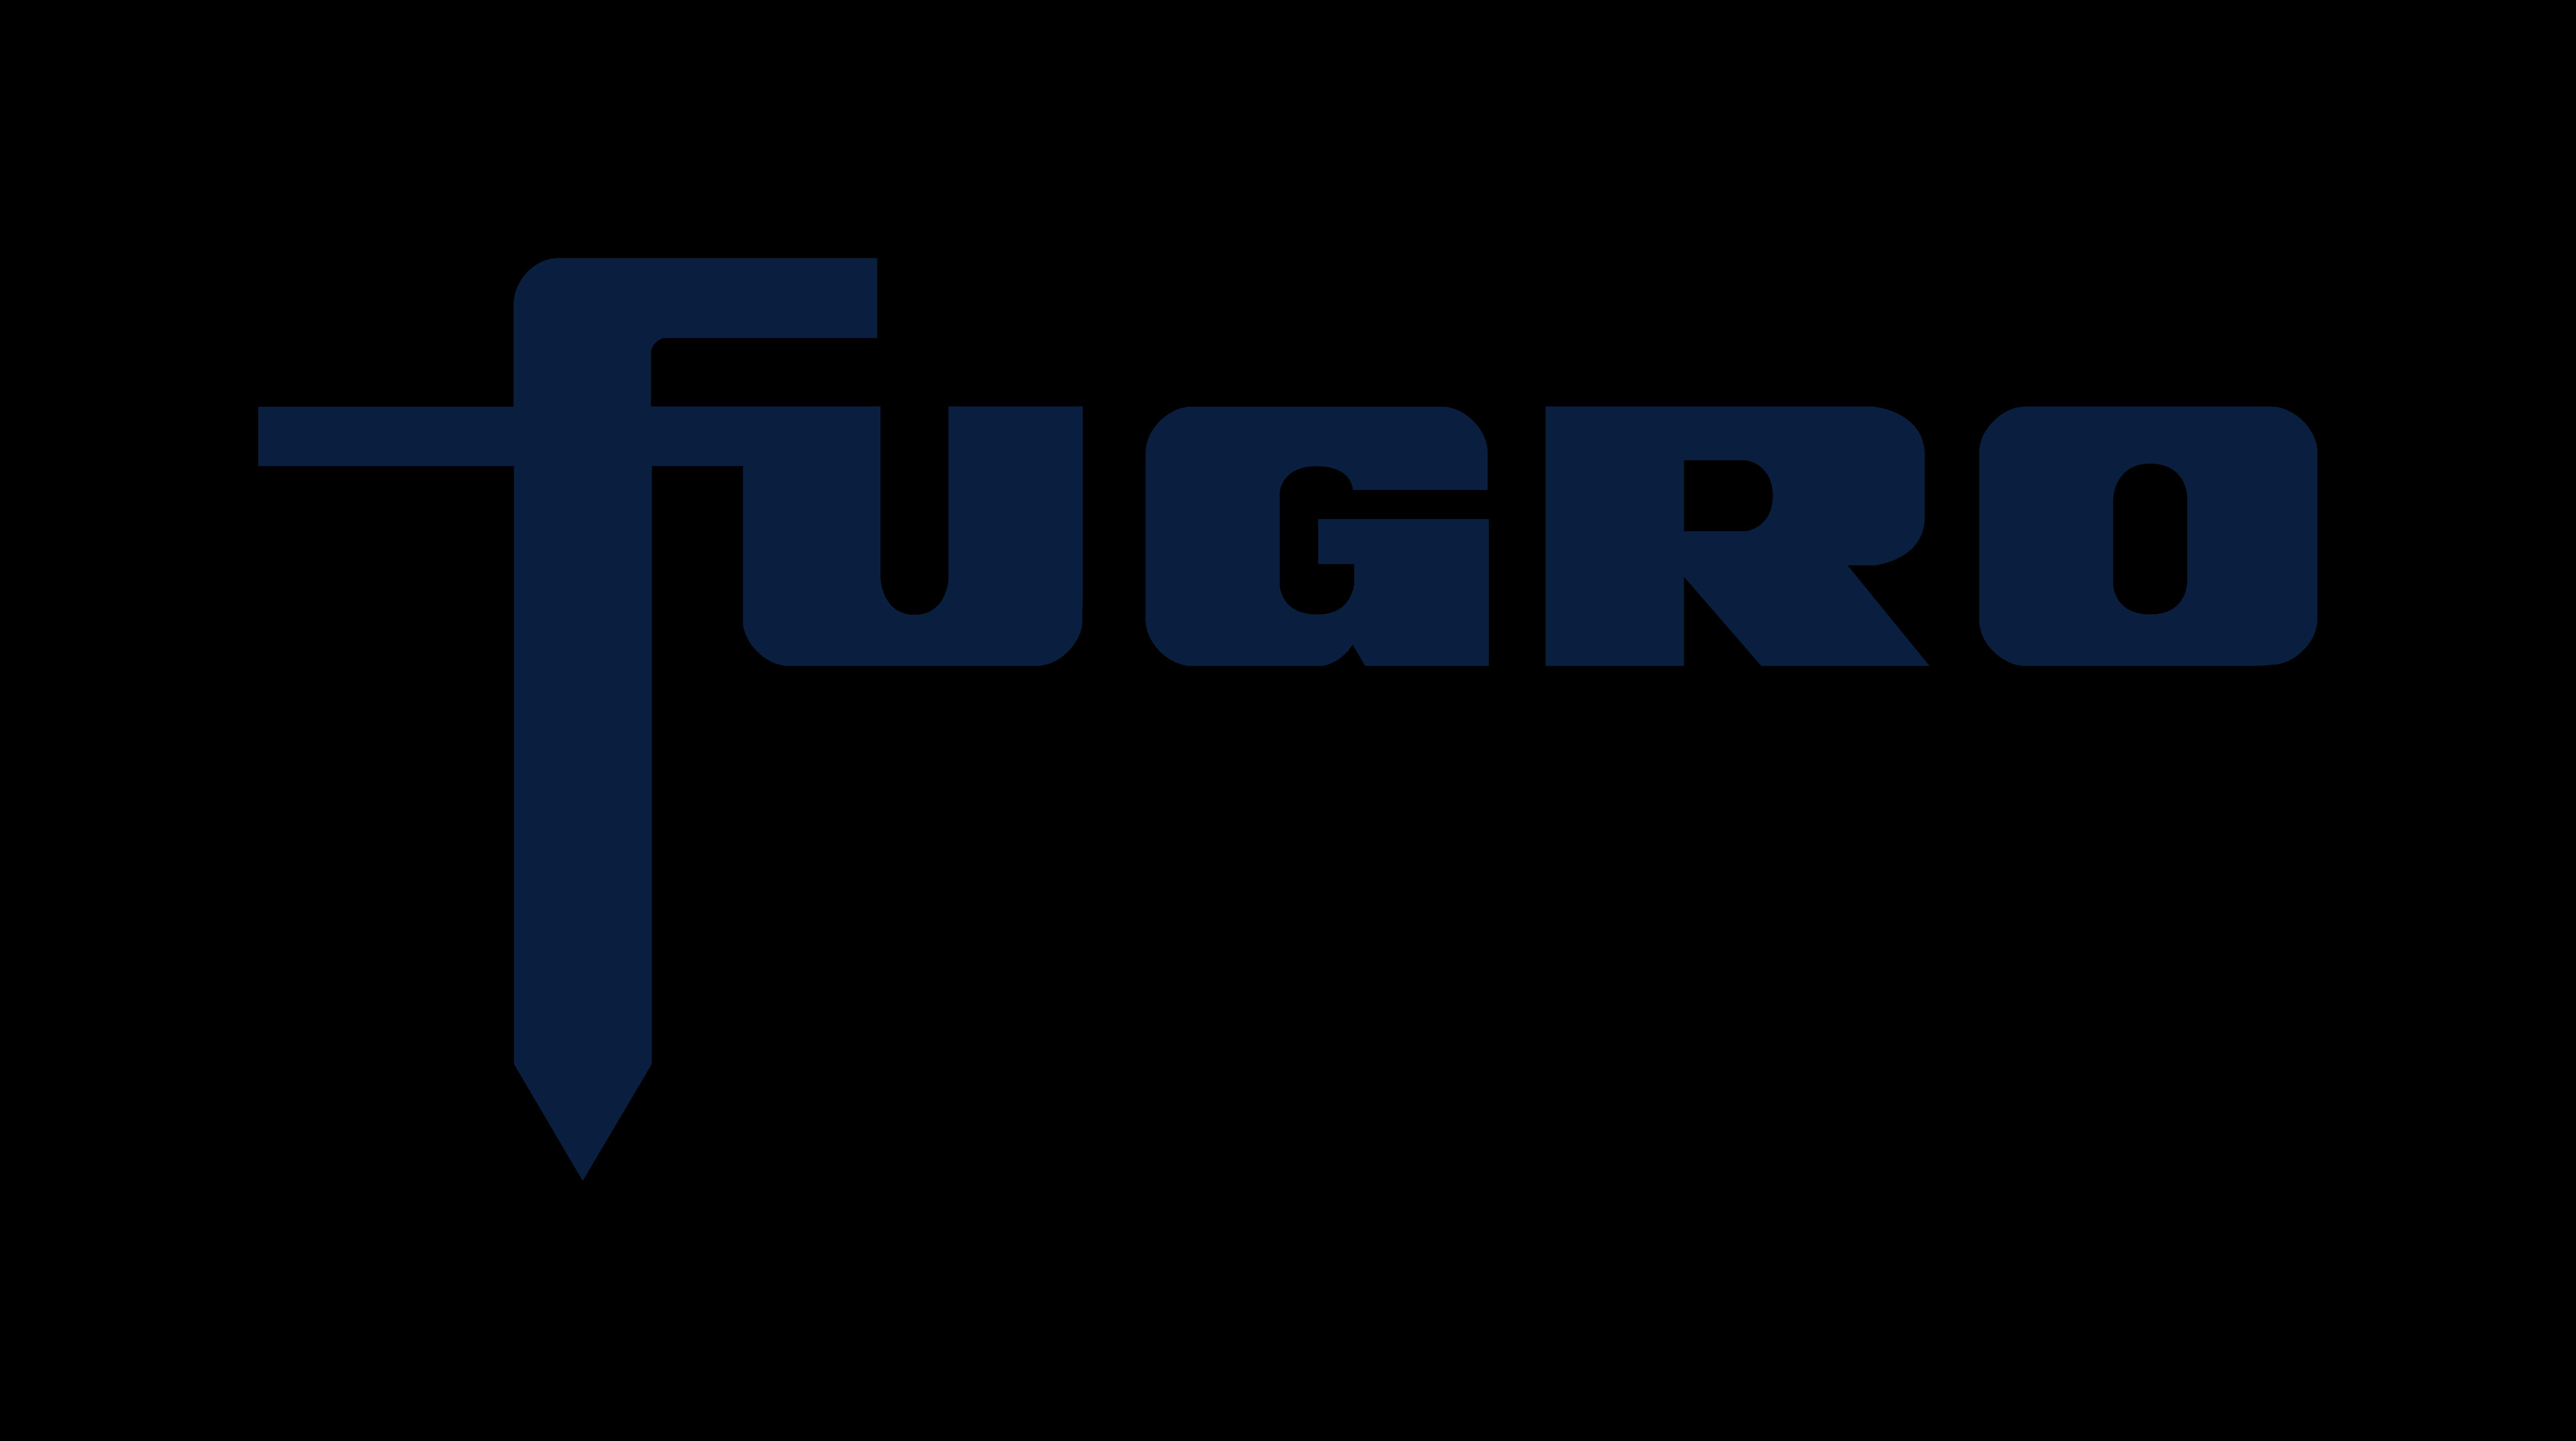 Logotipo de Fugro